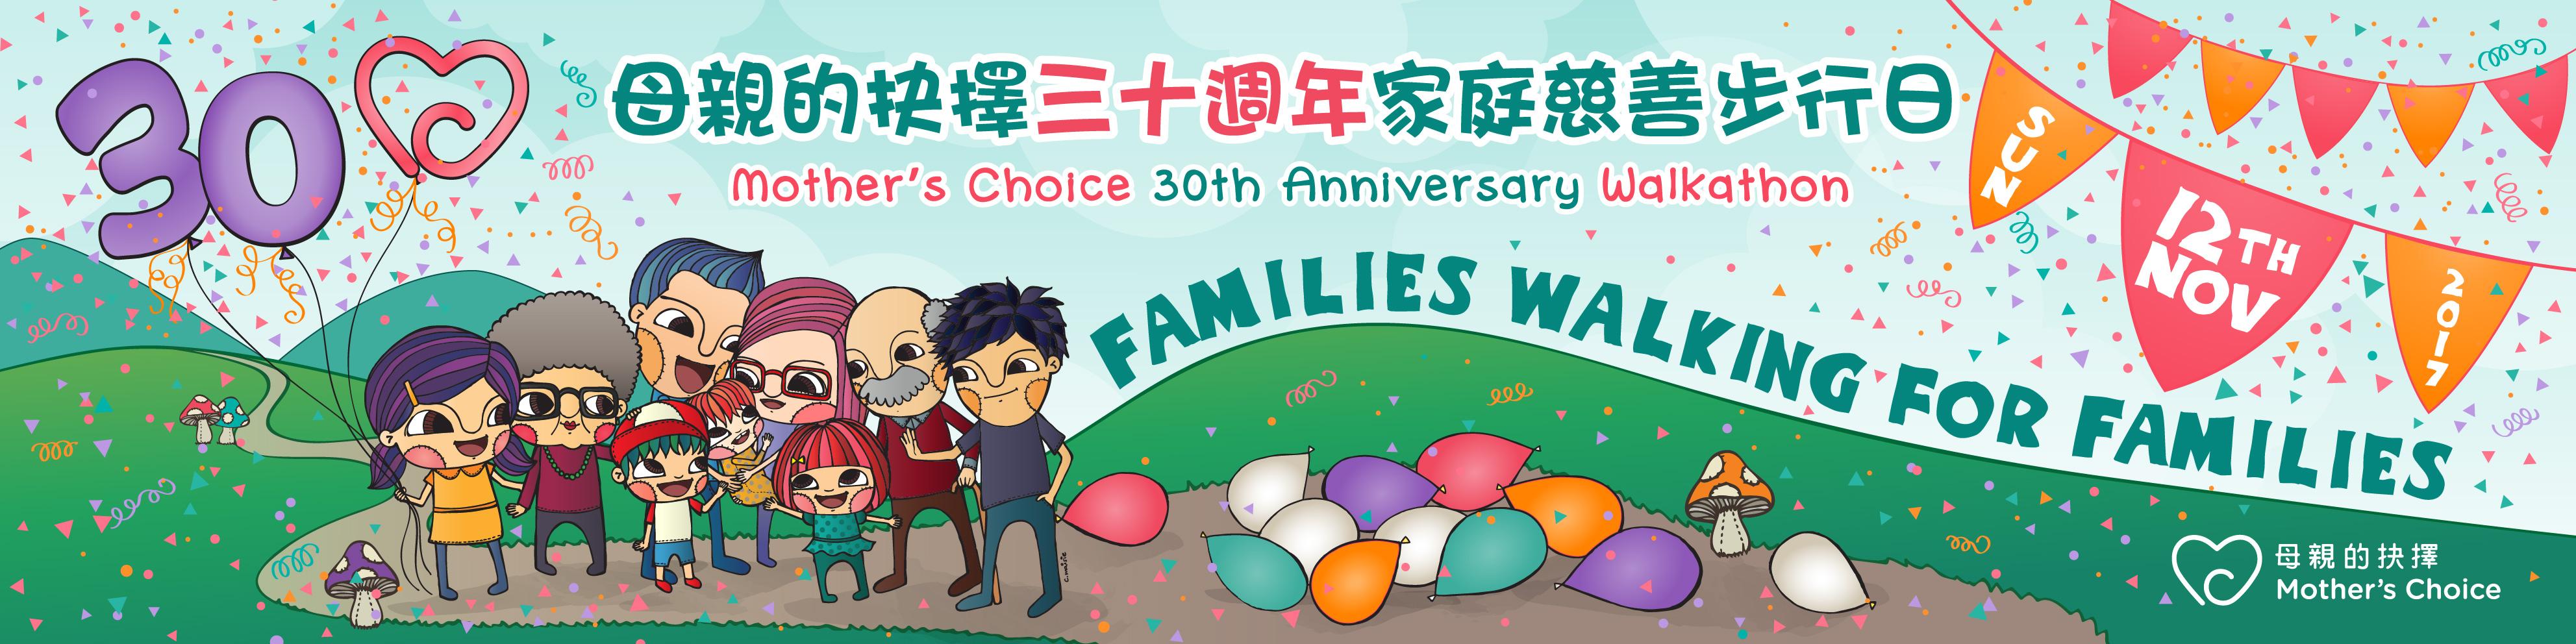 Mother's Choice 30th Anniversary Walkathon